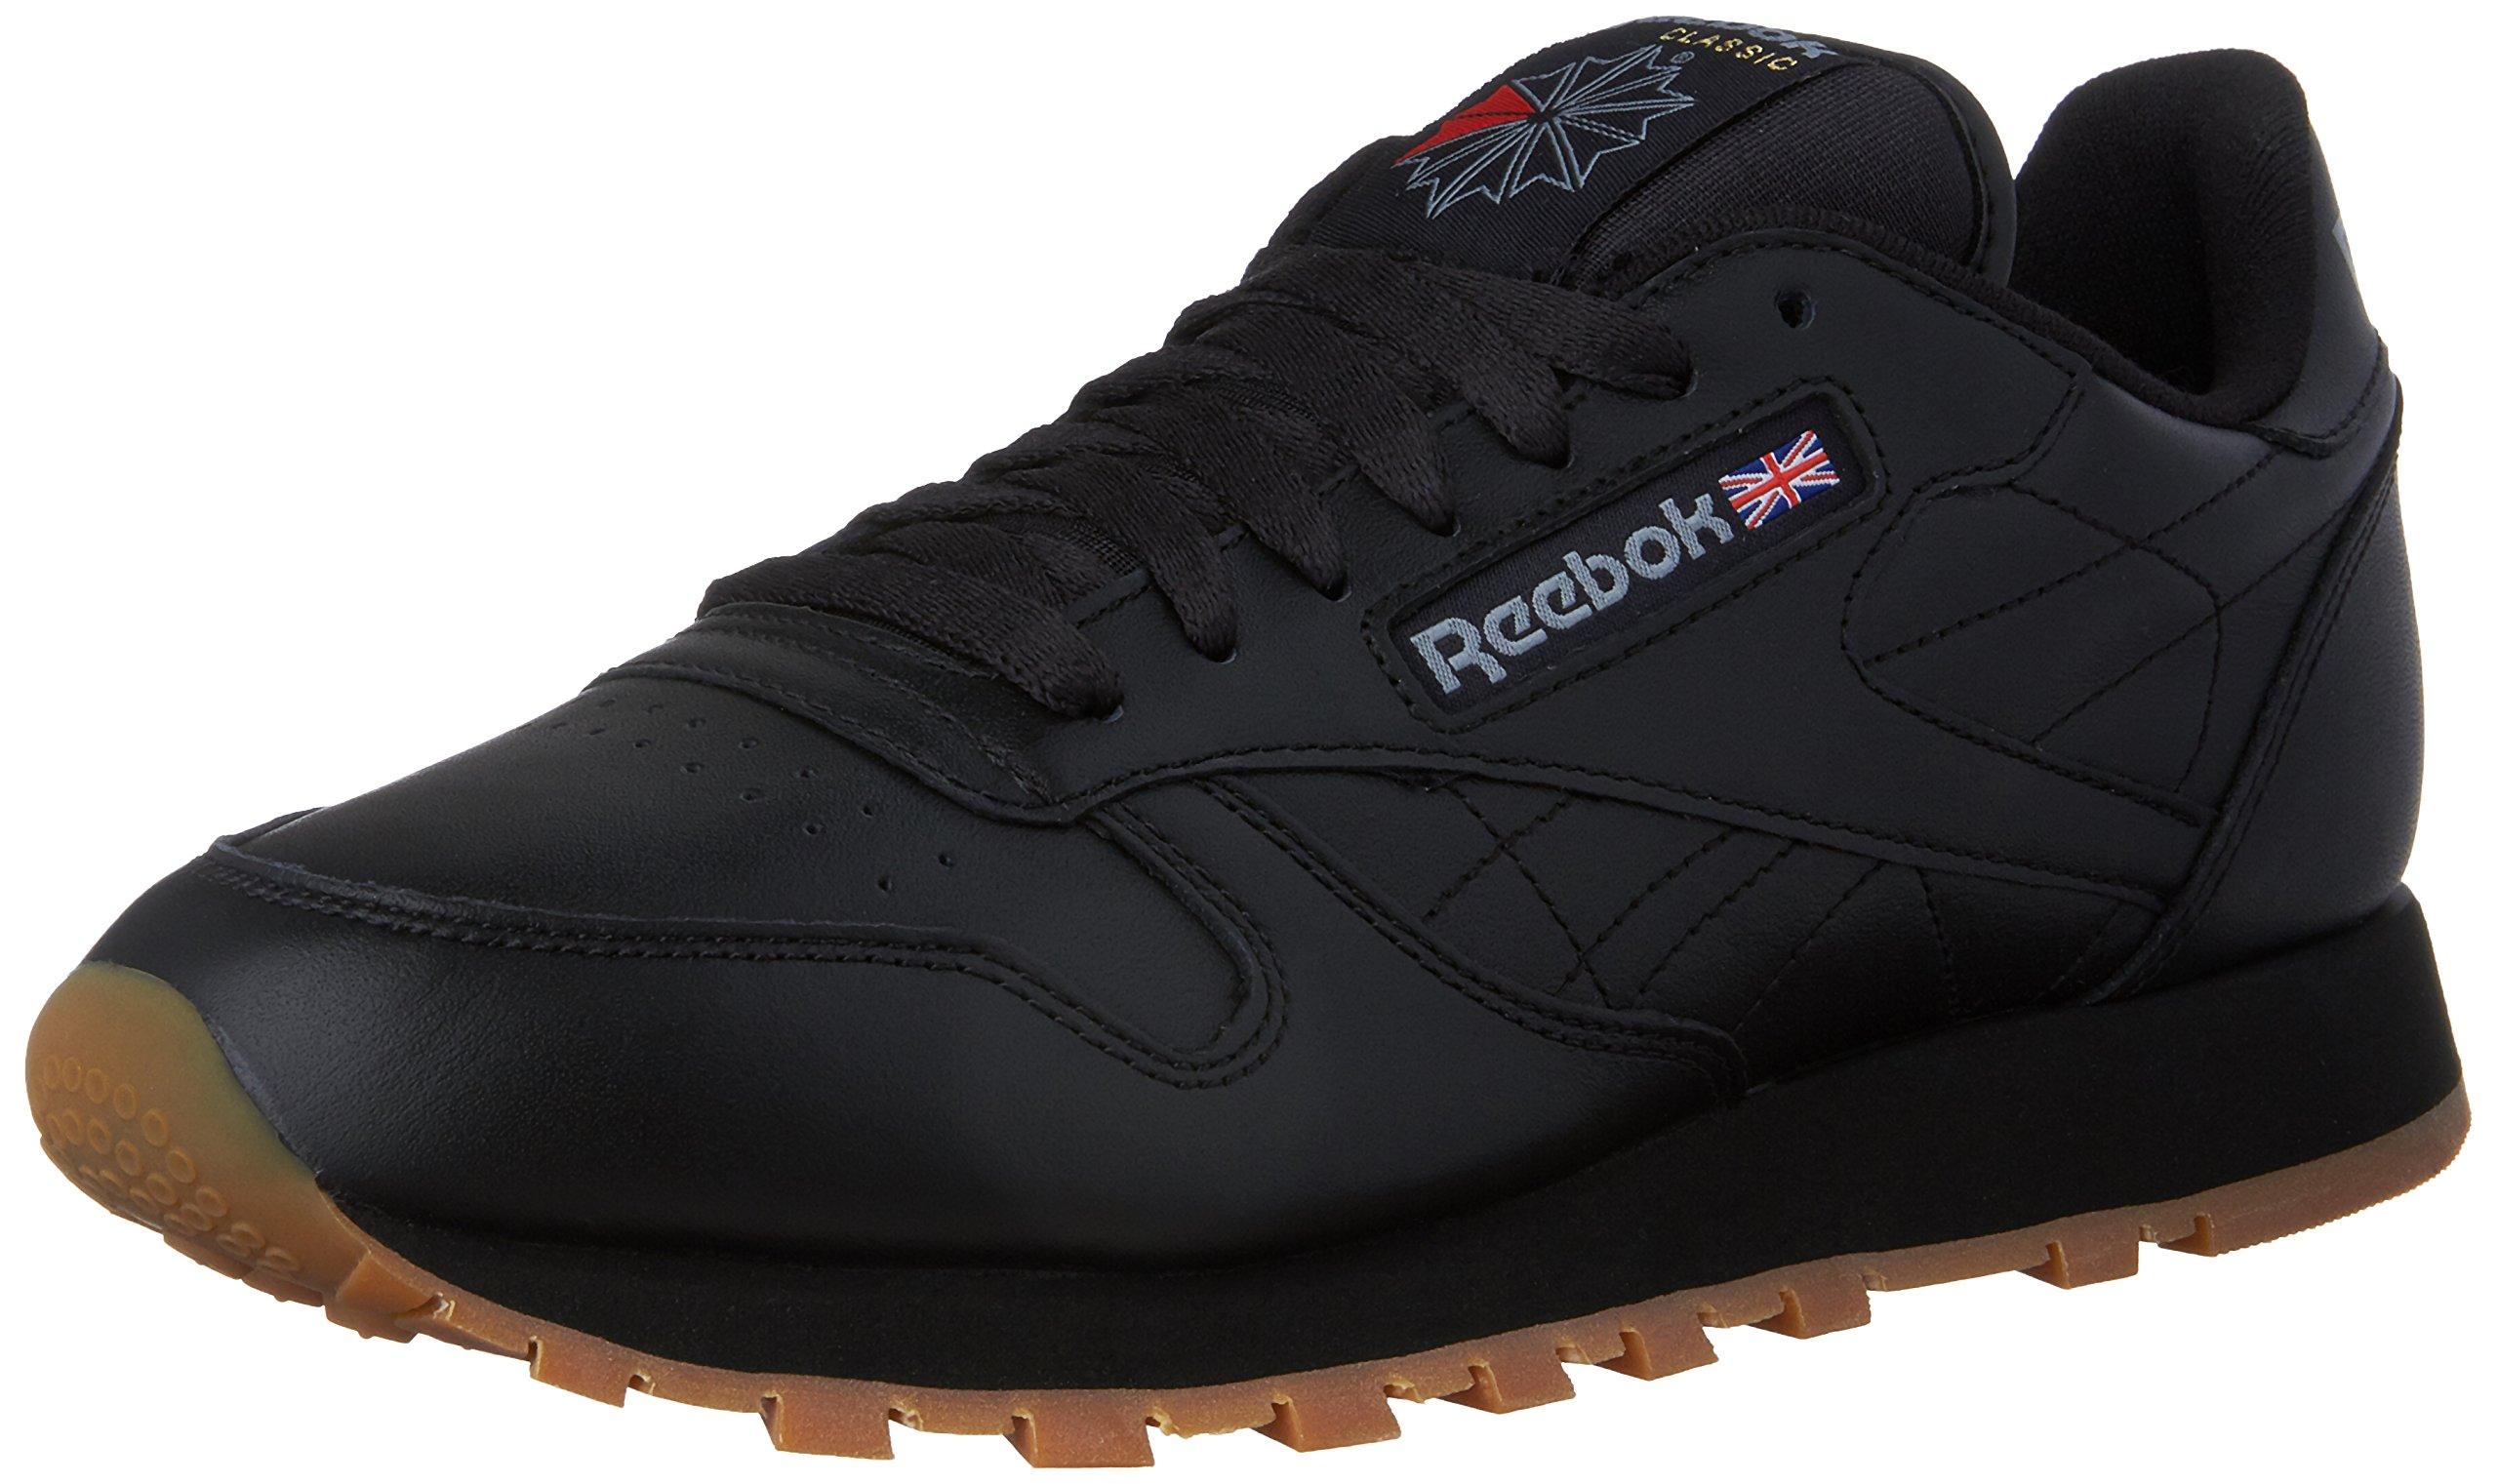 Reebok Men's Classic Leather Sneaker, Black/Gum, 10.5 M US